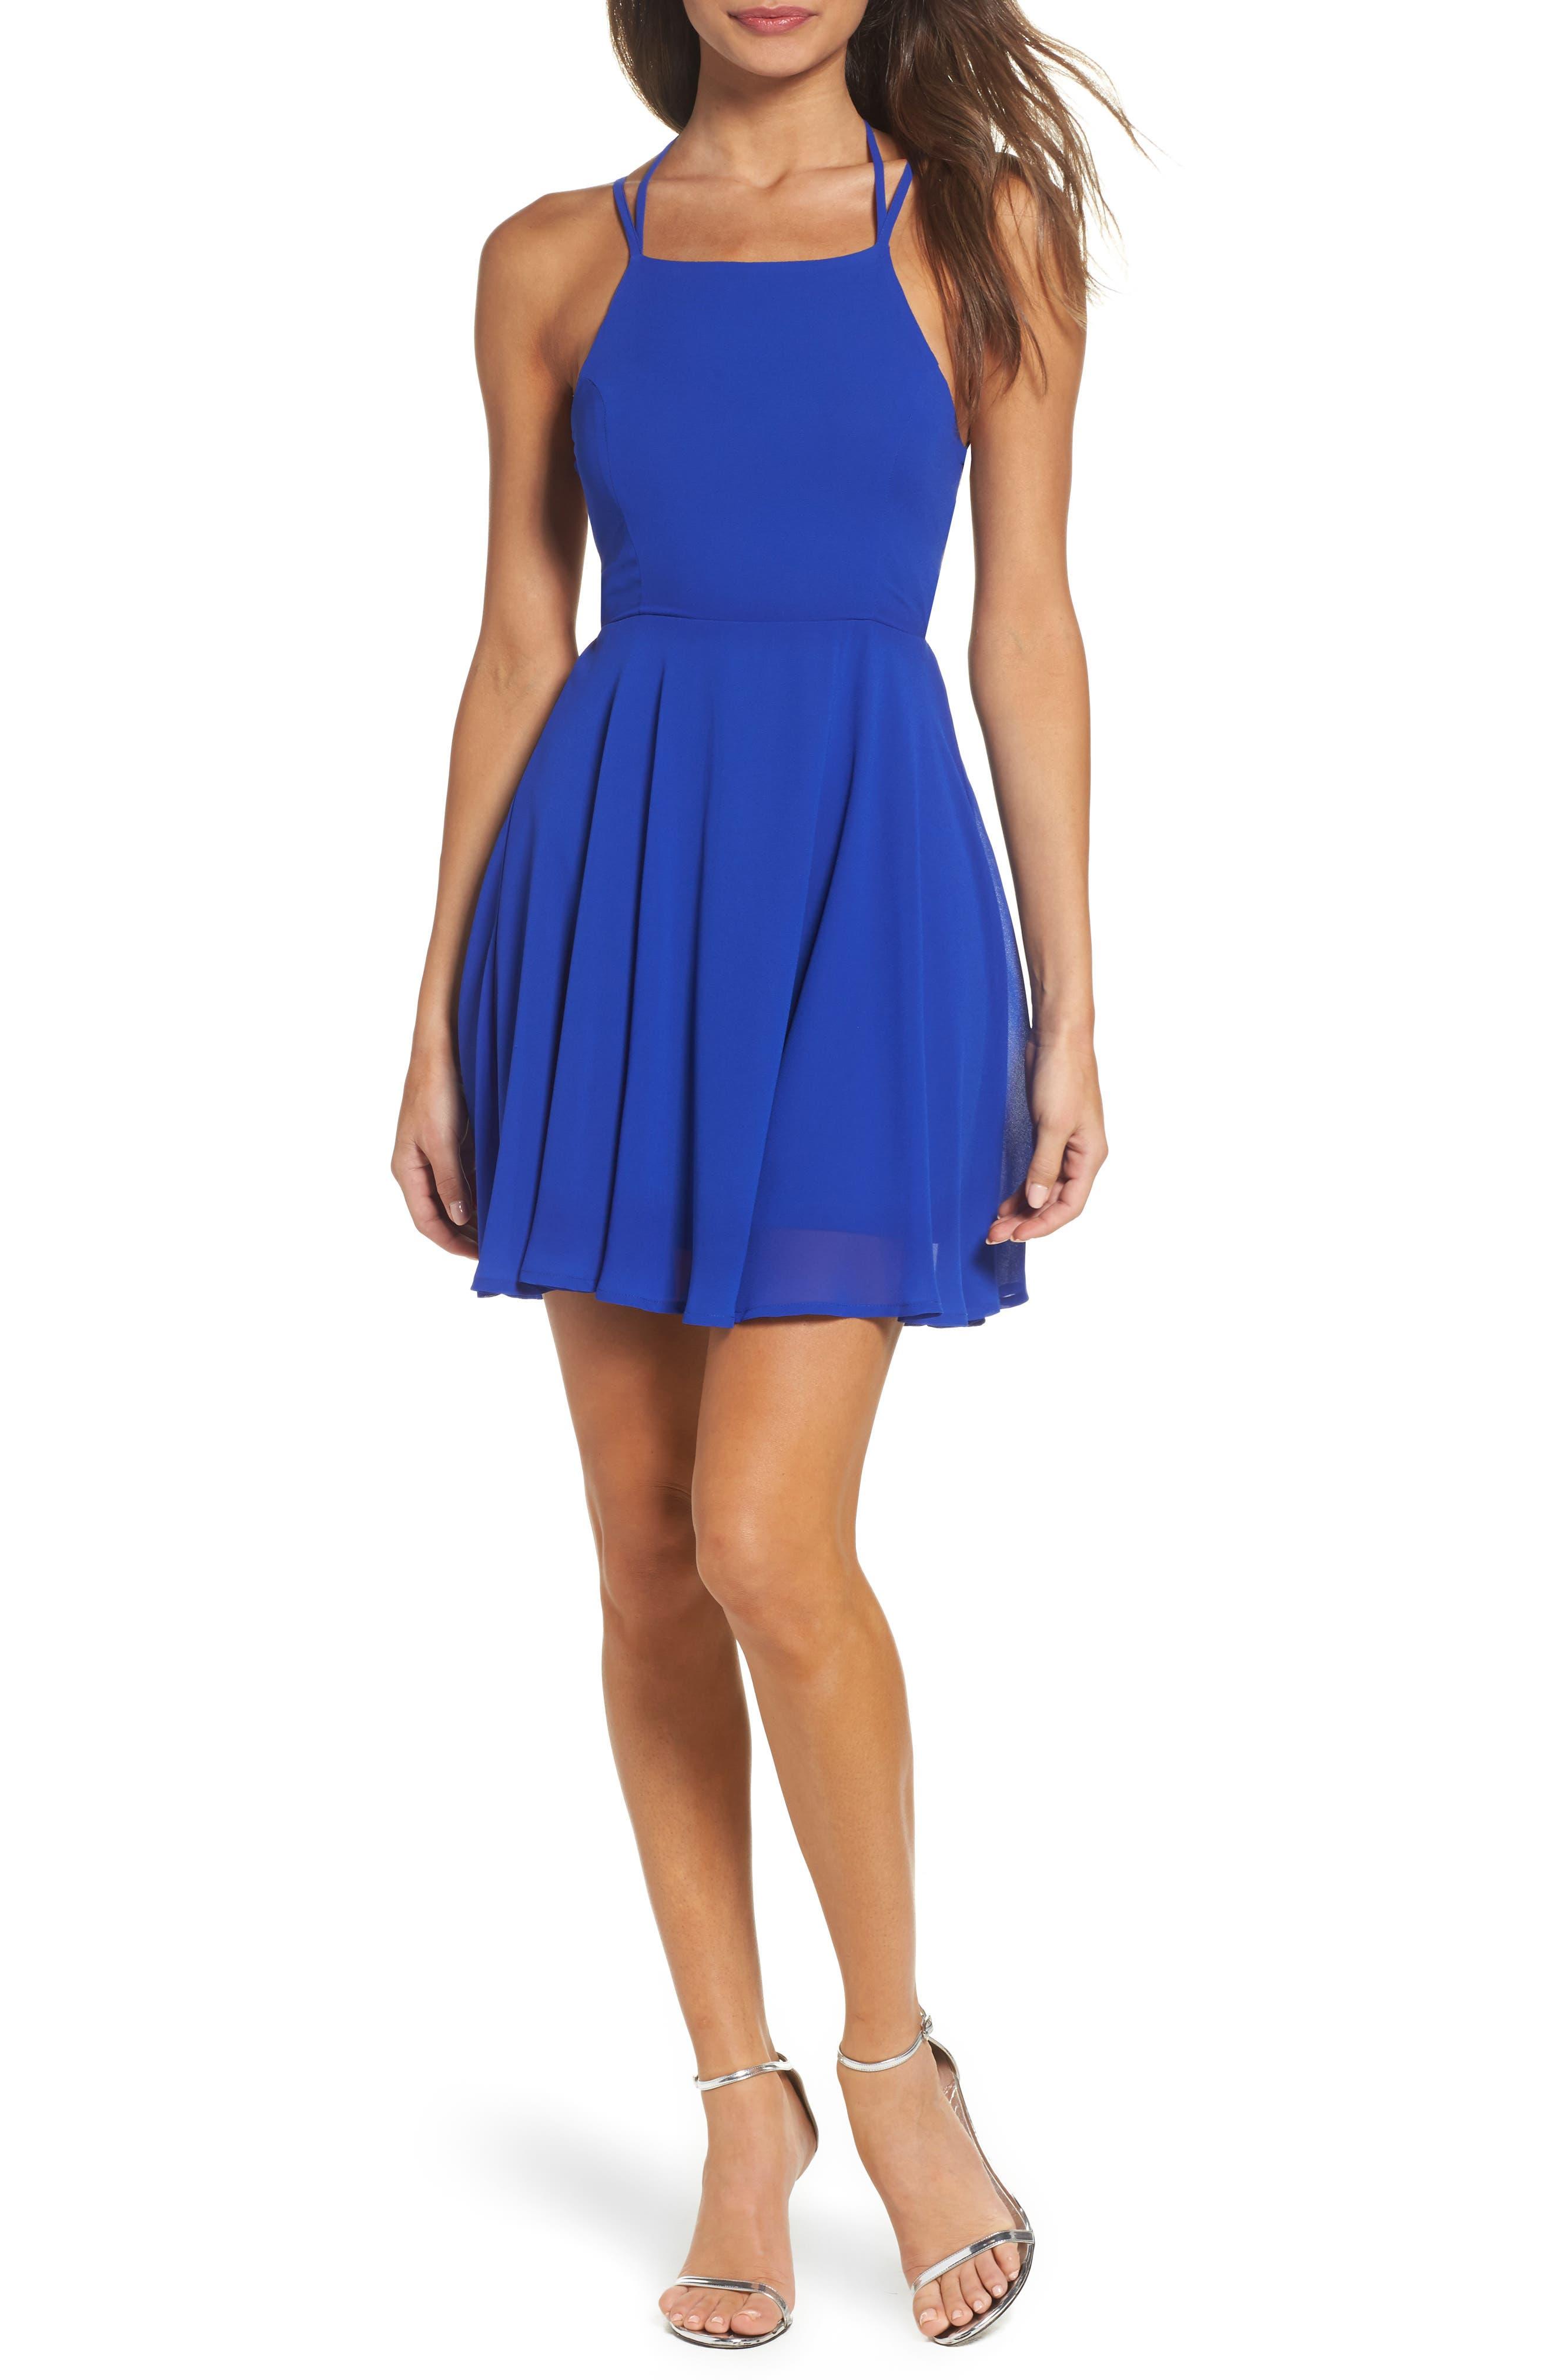 LULUS, Good Deeds Lace-Up Skater Dress, Main thumbnail 1, color, ROYAL BLUE